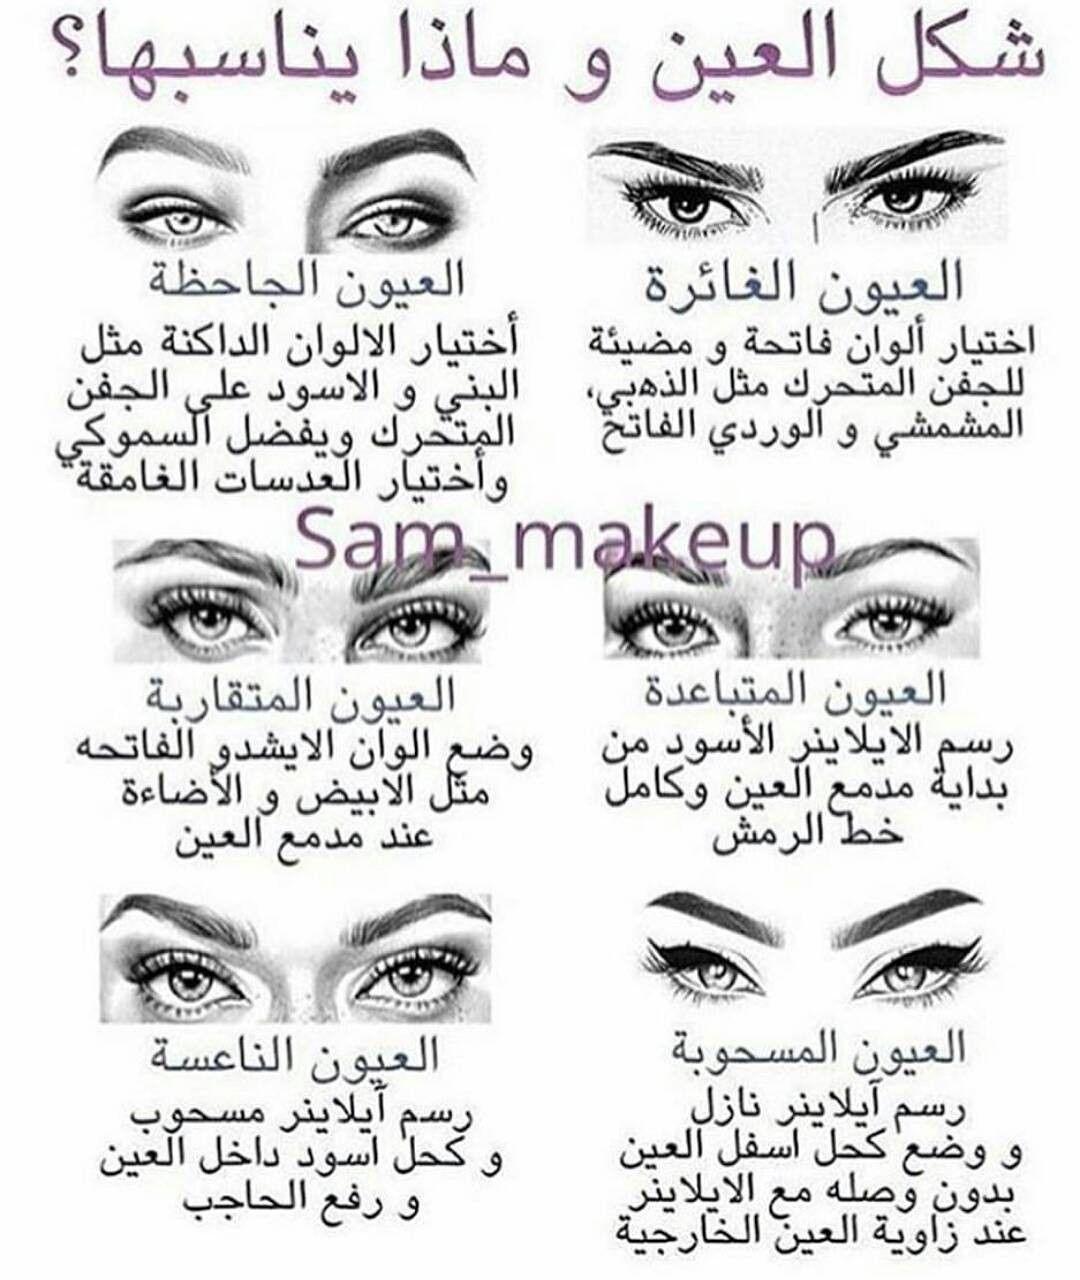 Pin By مريومه Maryomh On شكل العين وماذا يناسبها Pinterest Makeup Eye Makeup Skin Makeup